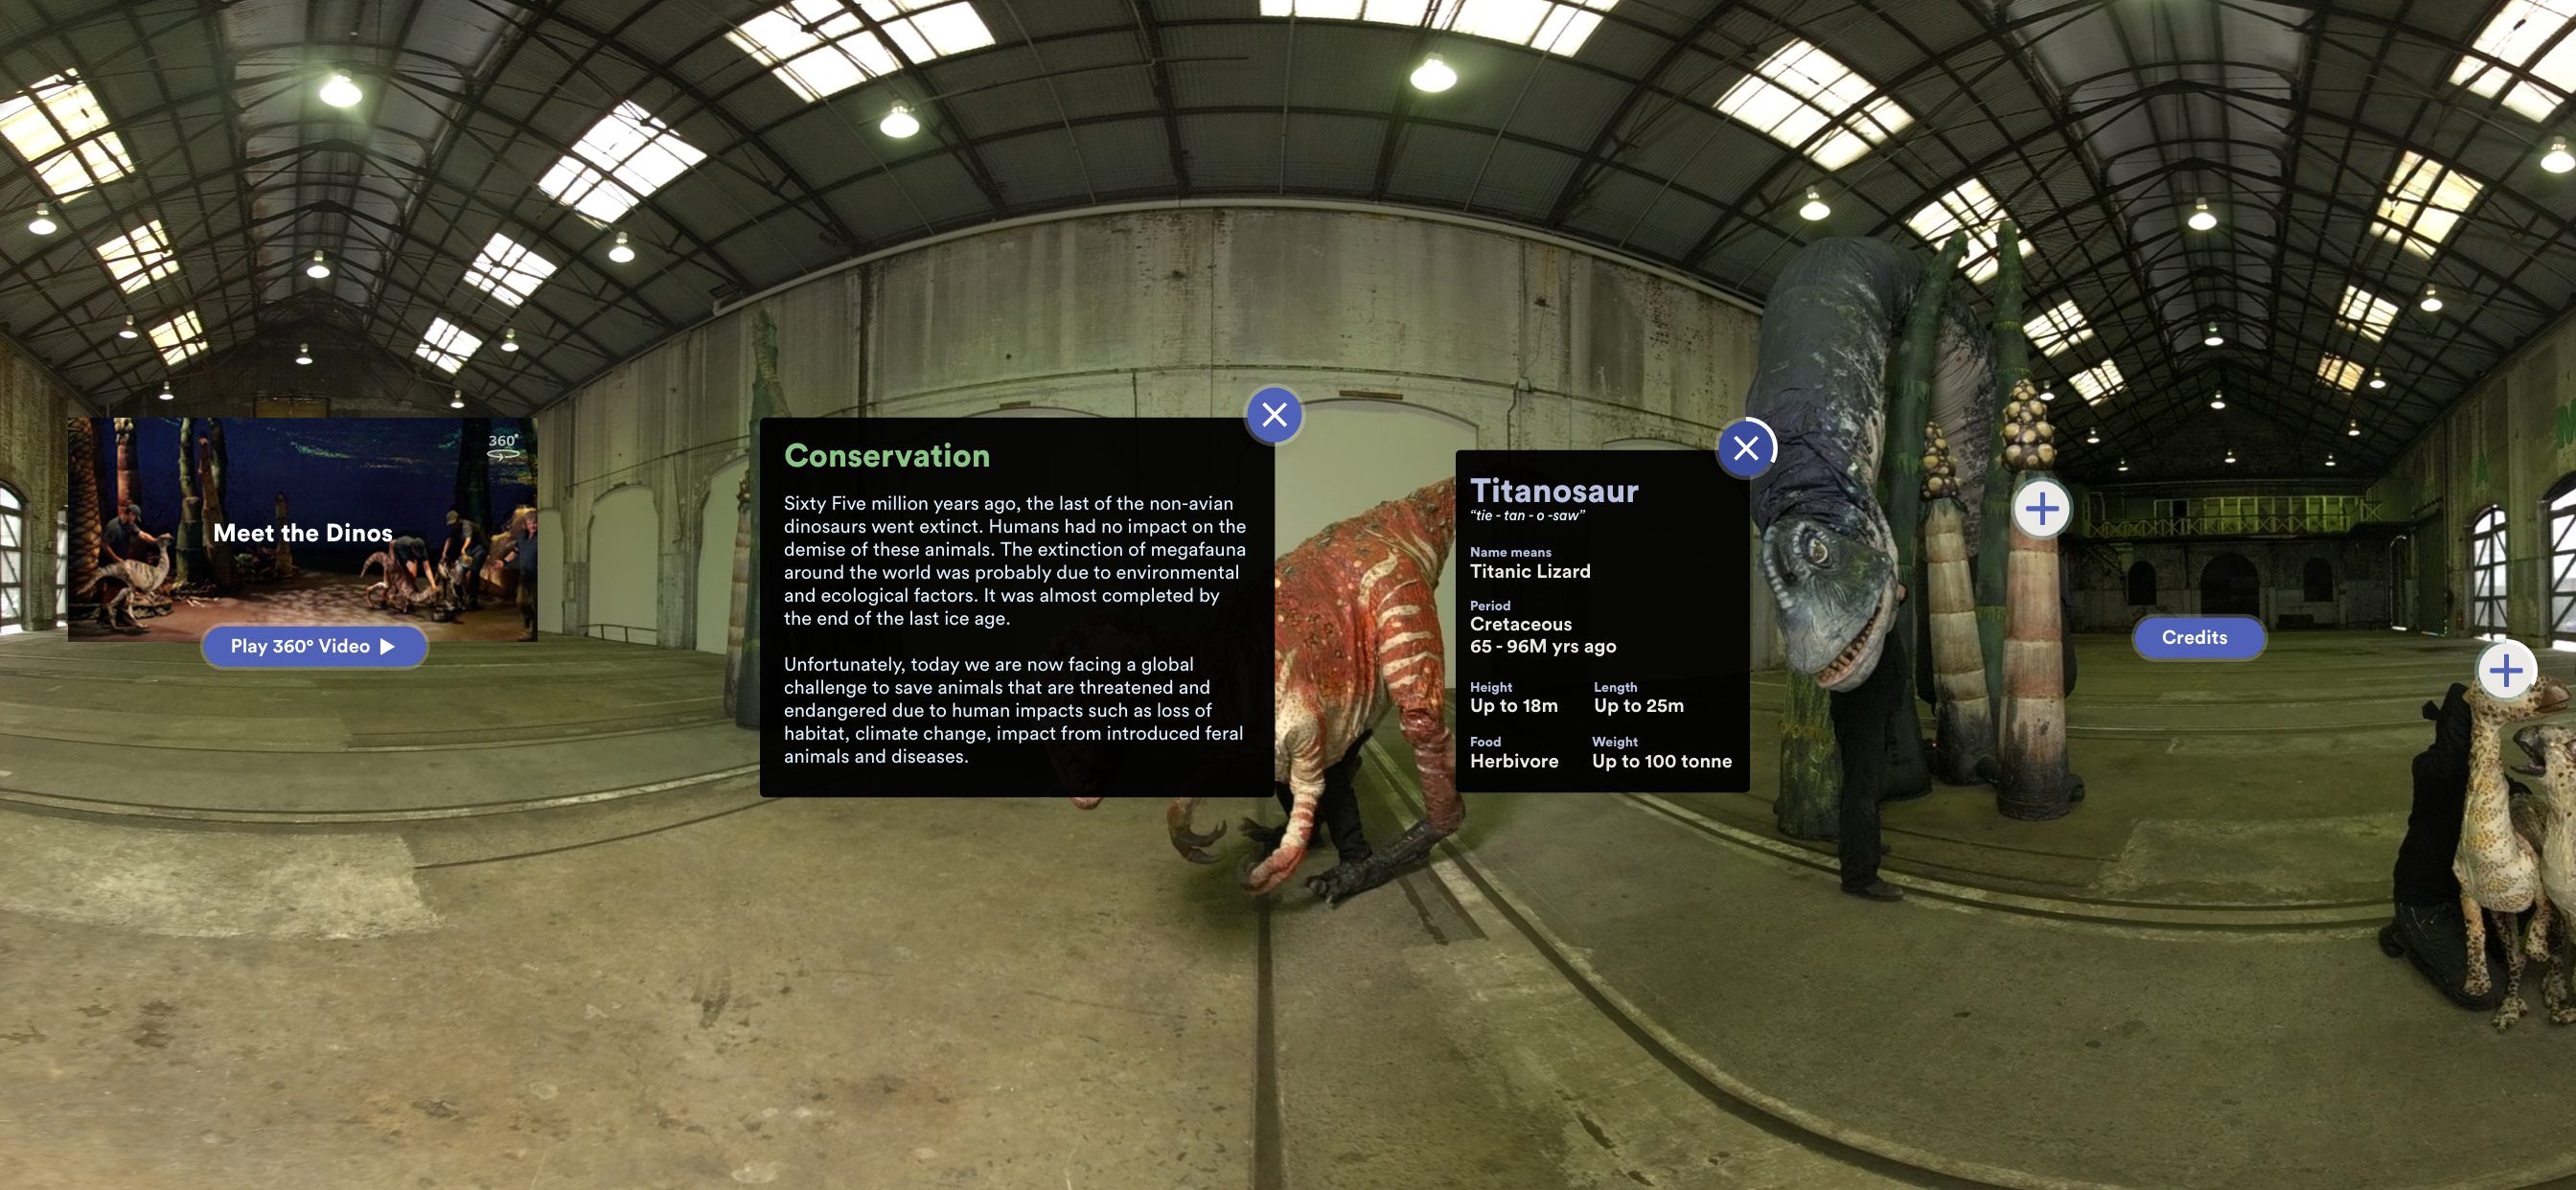 Digital Dinos menu by Sydney Opera House and Erth